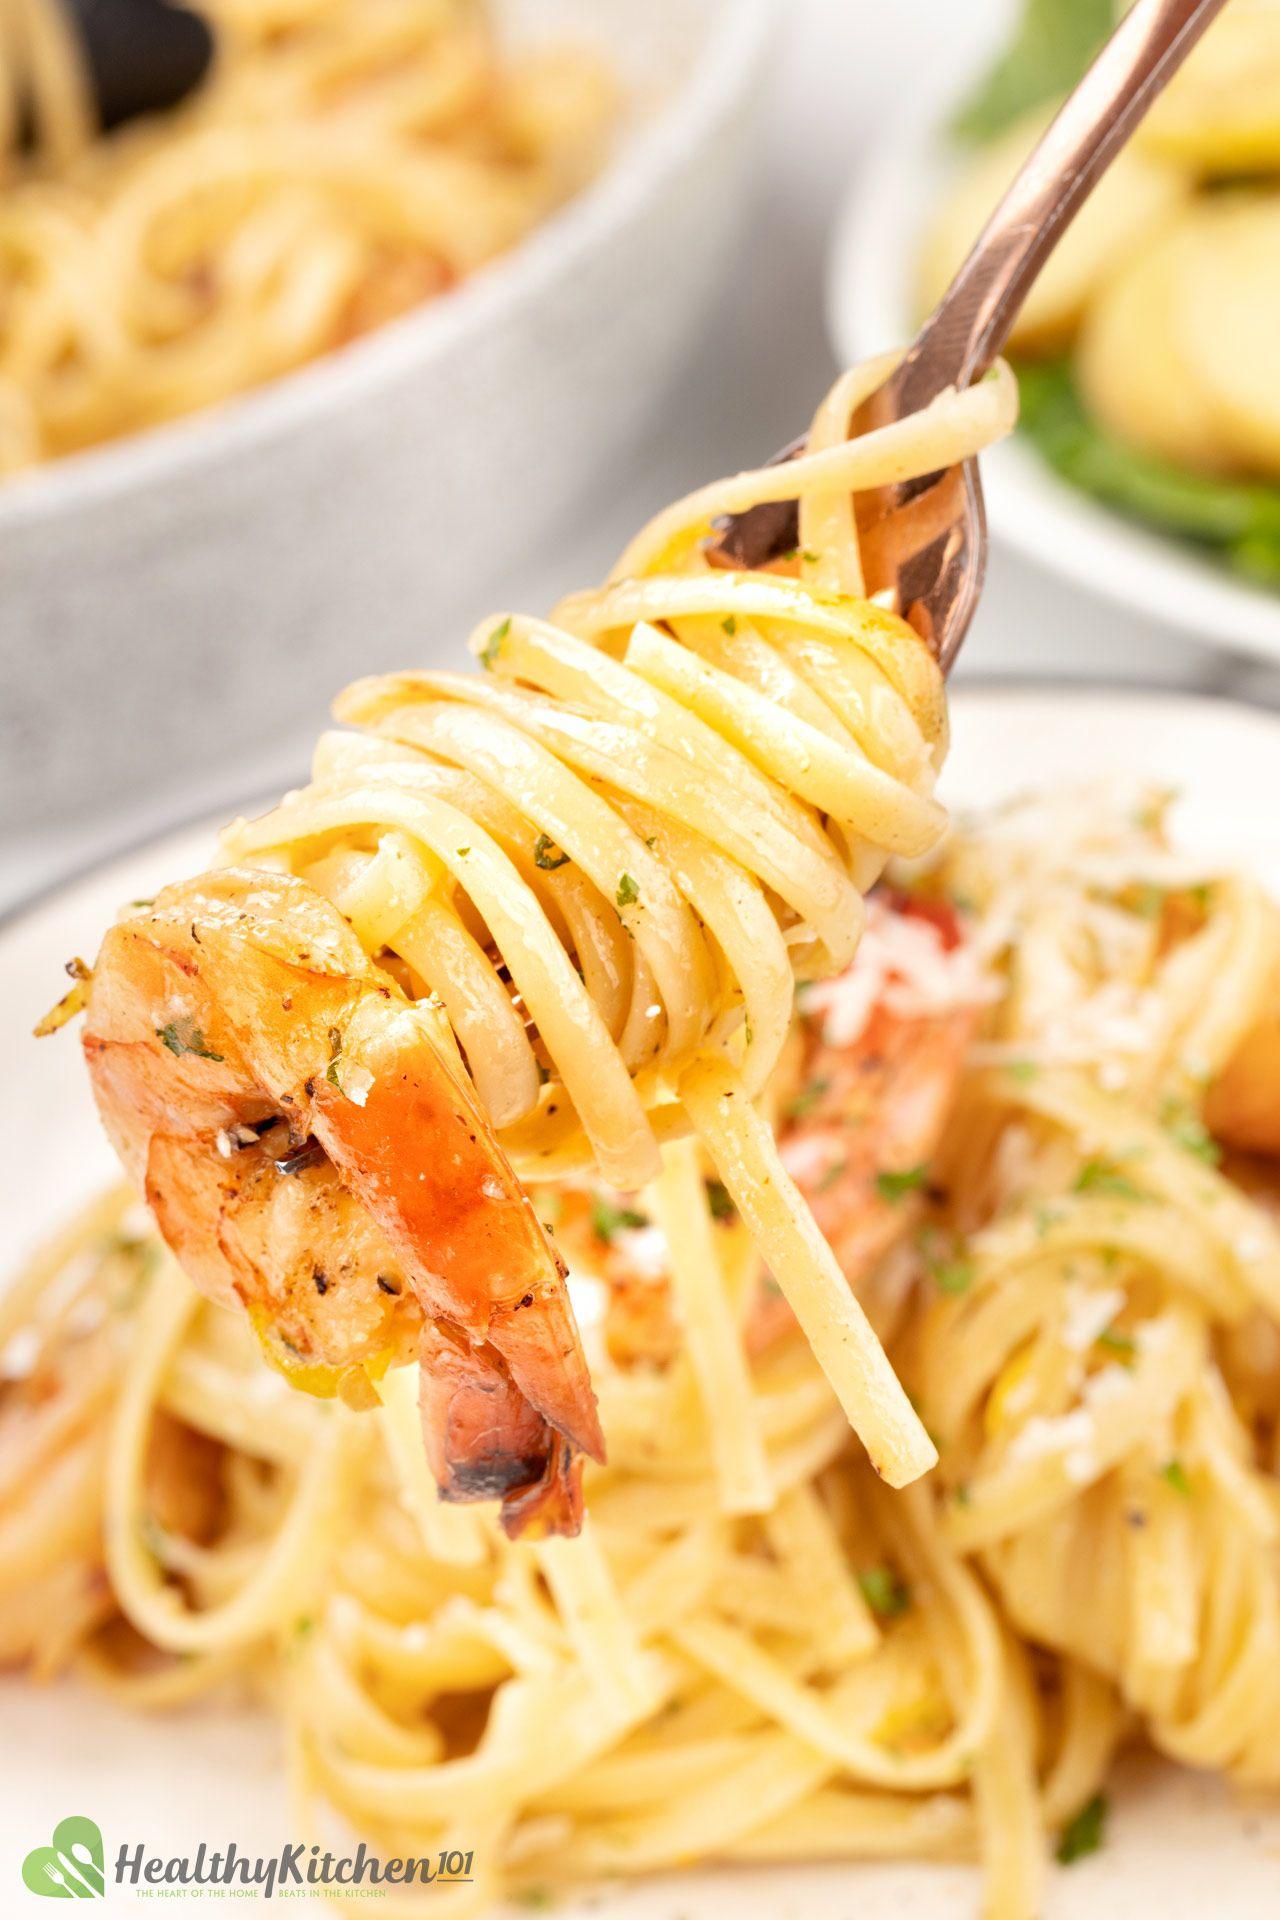 Is Shrimp Scampi Healthy?